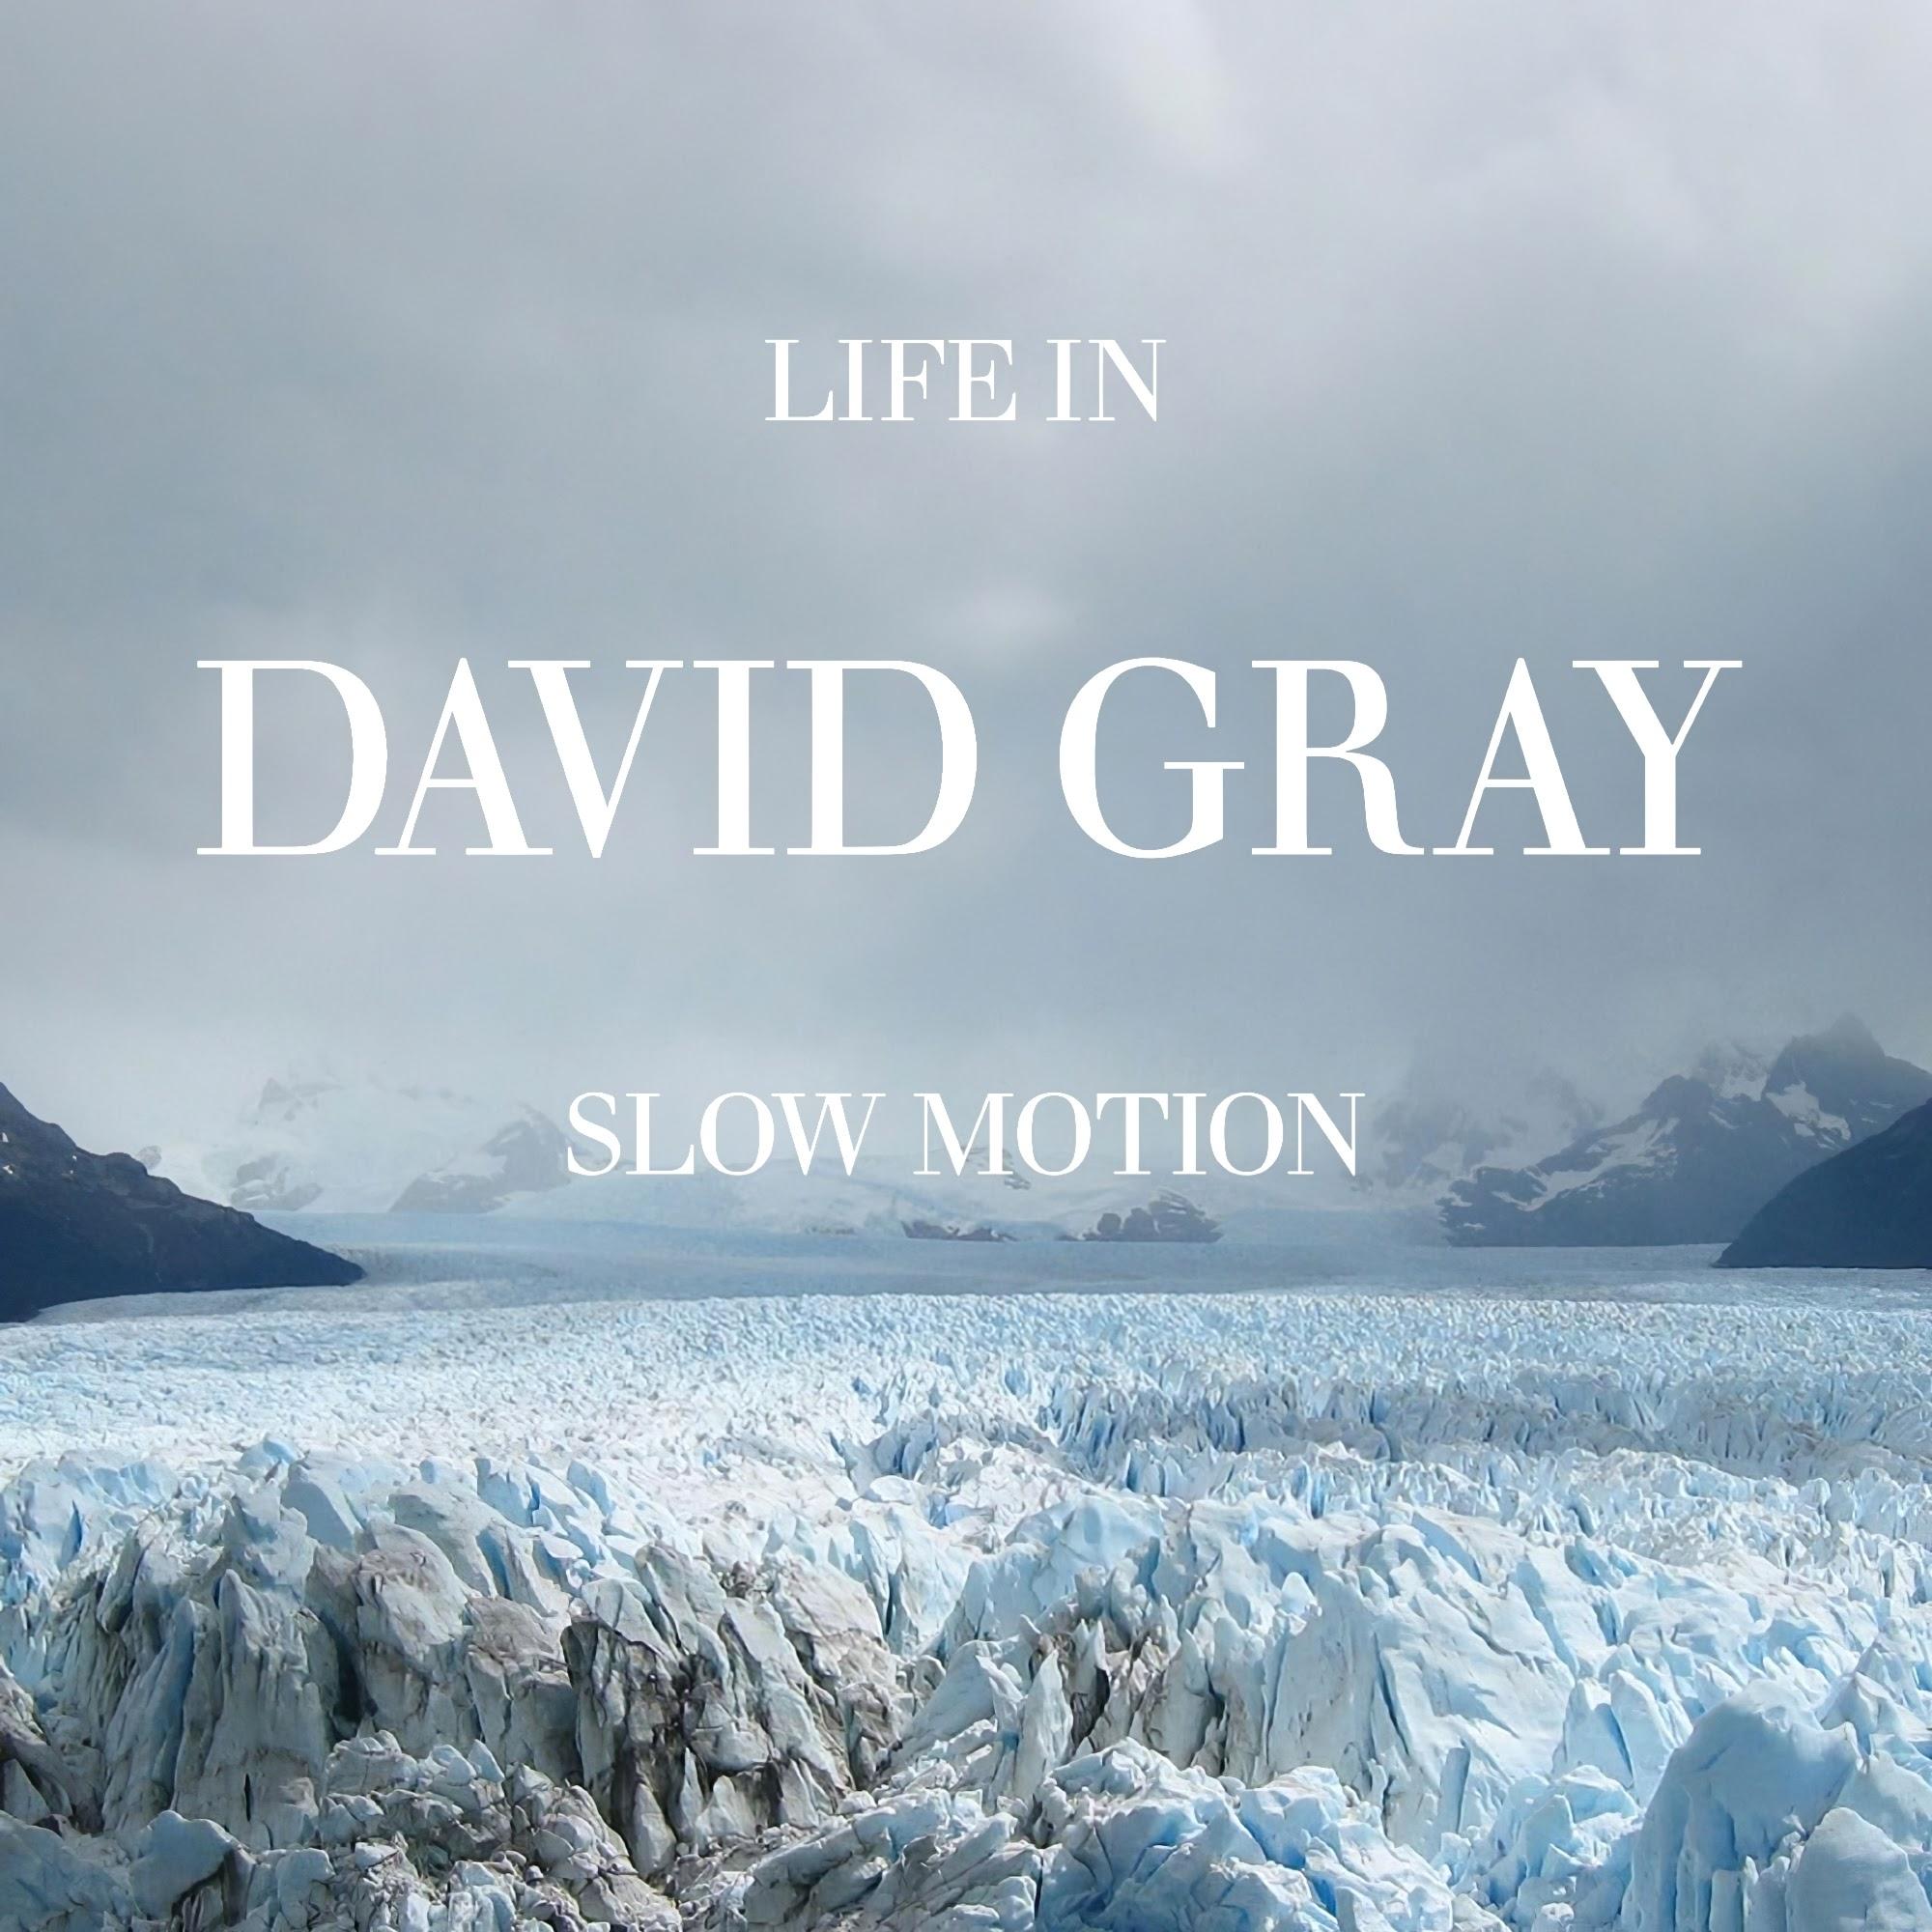 Album Artist: David Gray / Album Title: Life in Slow Motion